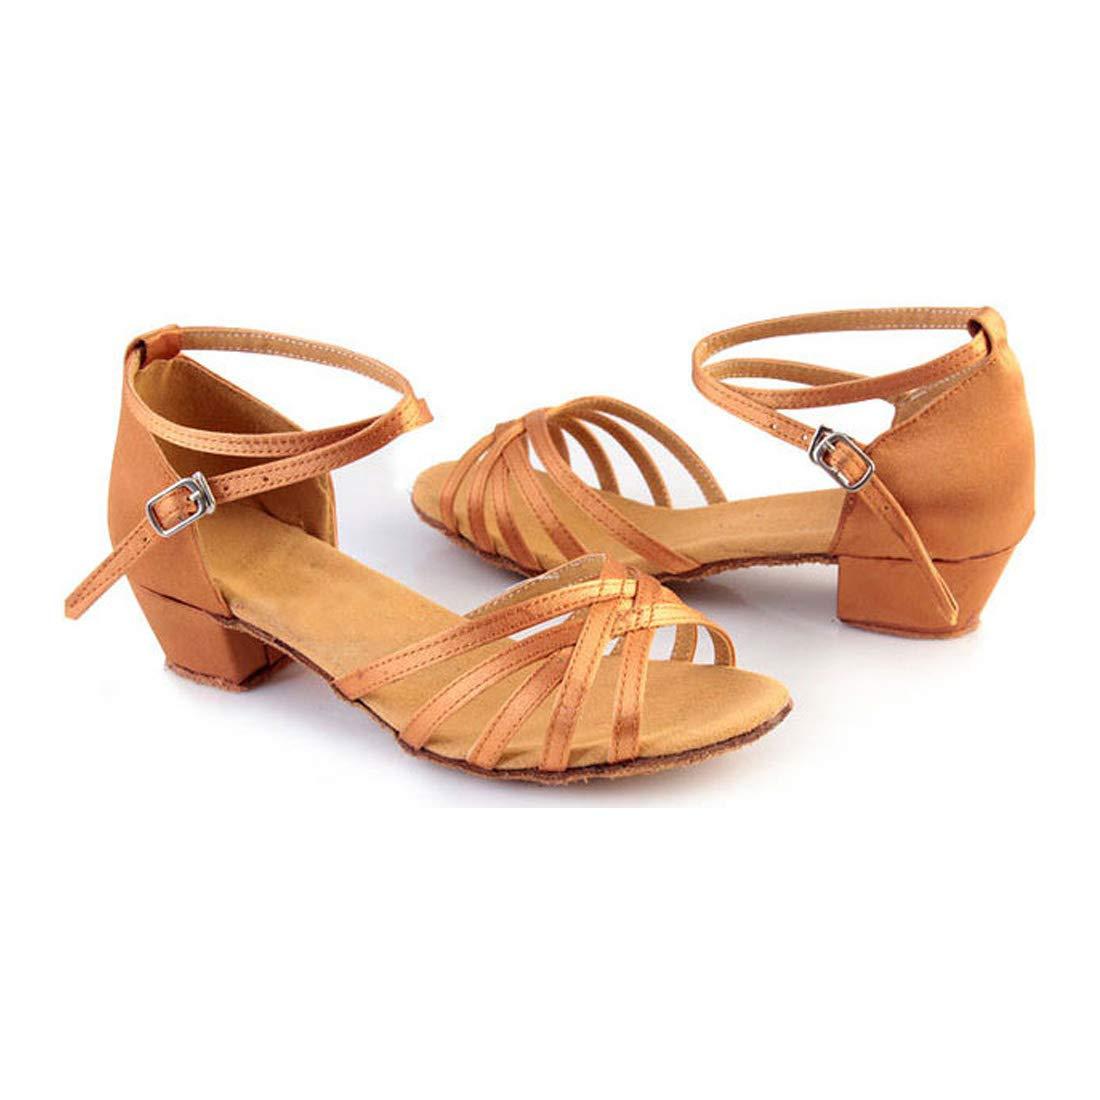 Aiweijia Girls Ballroom Dance Latin Salsa Performance Dancing Shoes Sandals